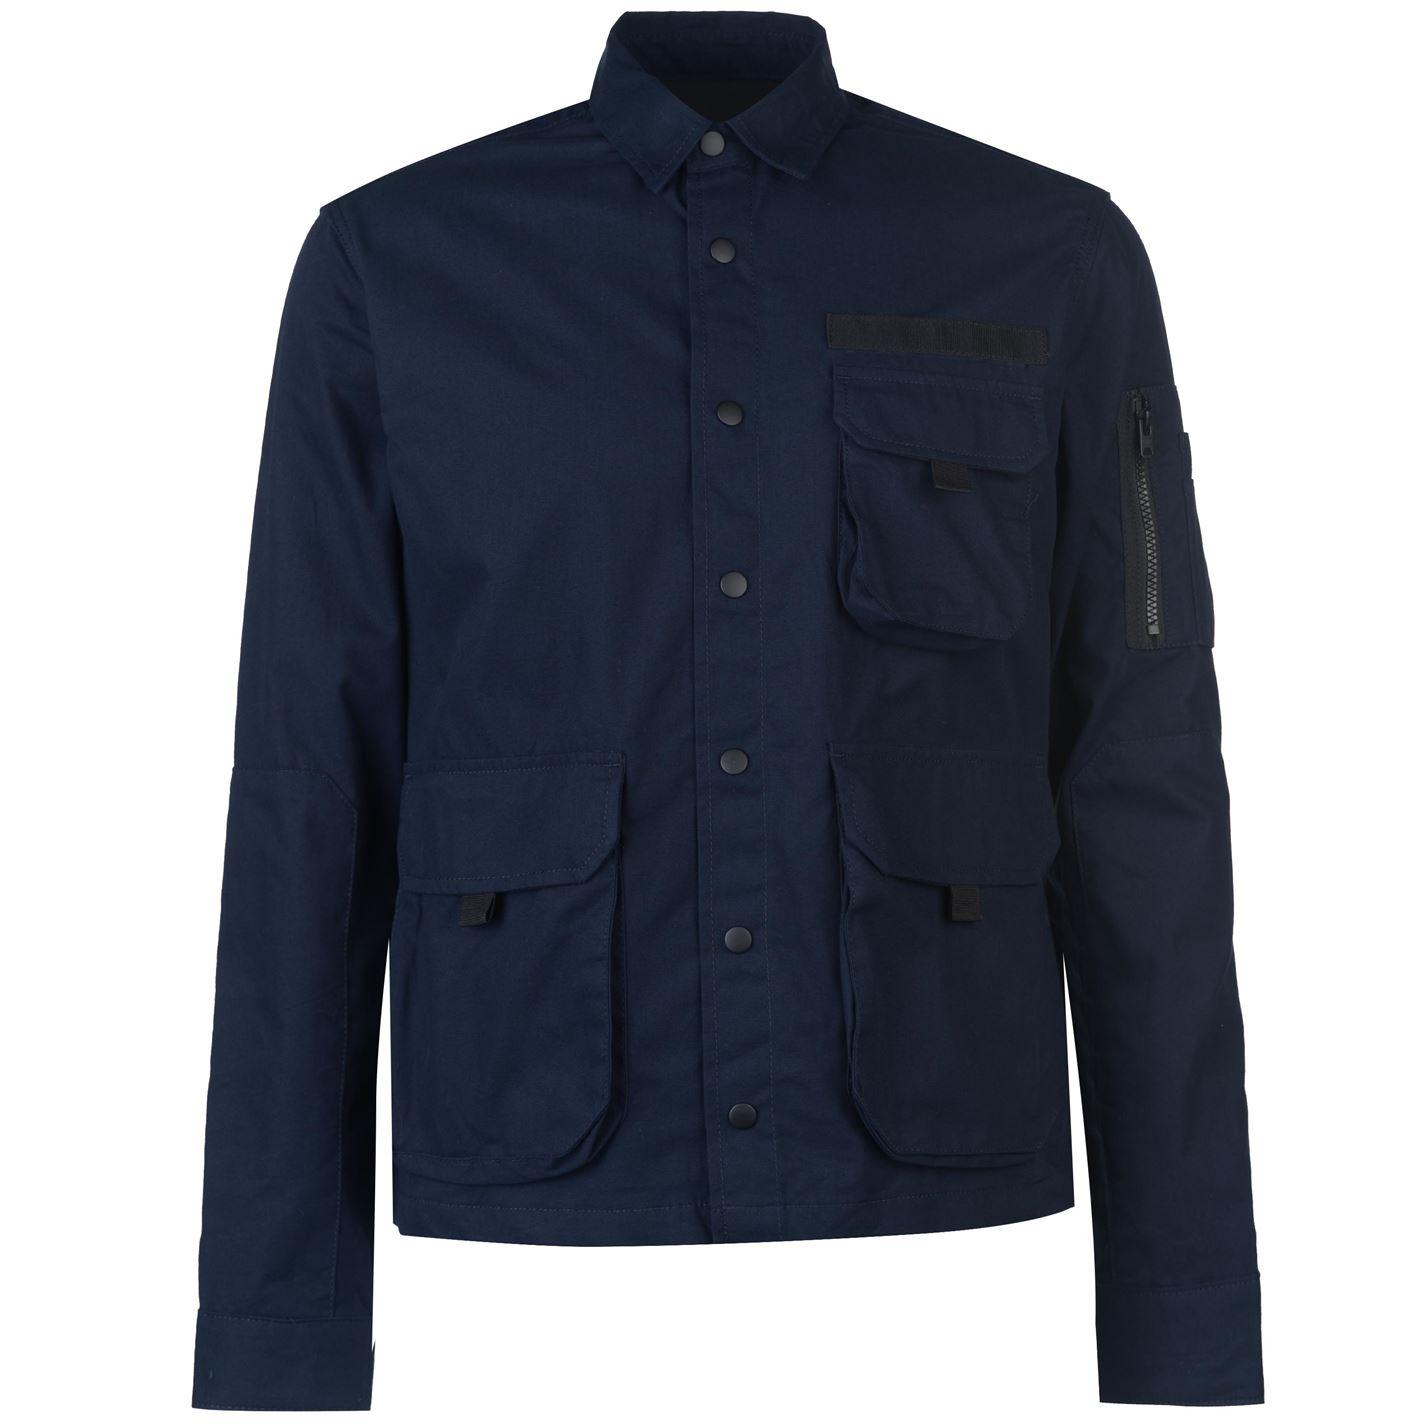 Jack and Jones Core West Long Sleeve Shirt